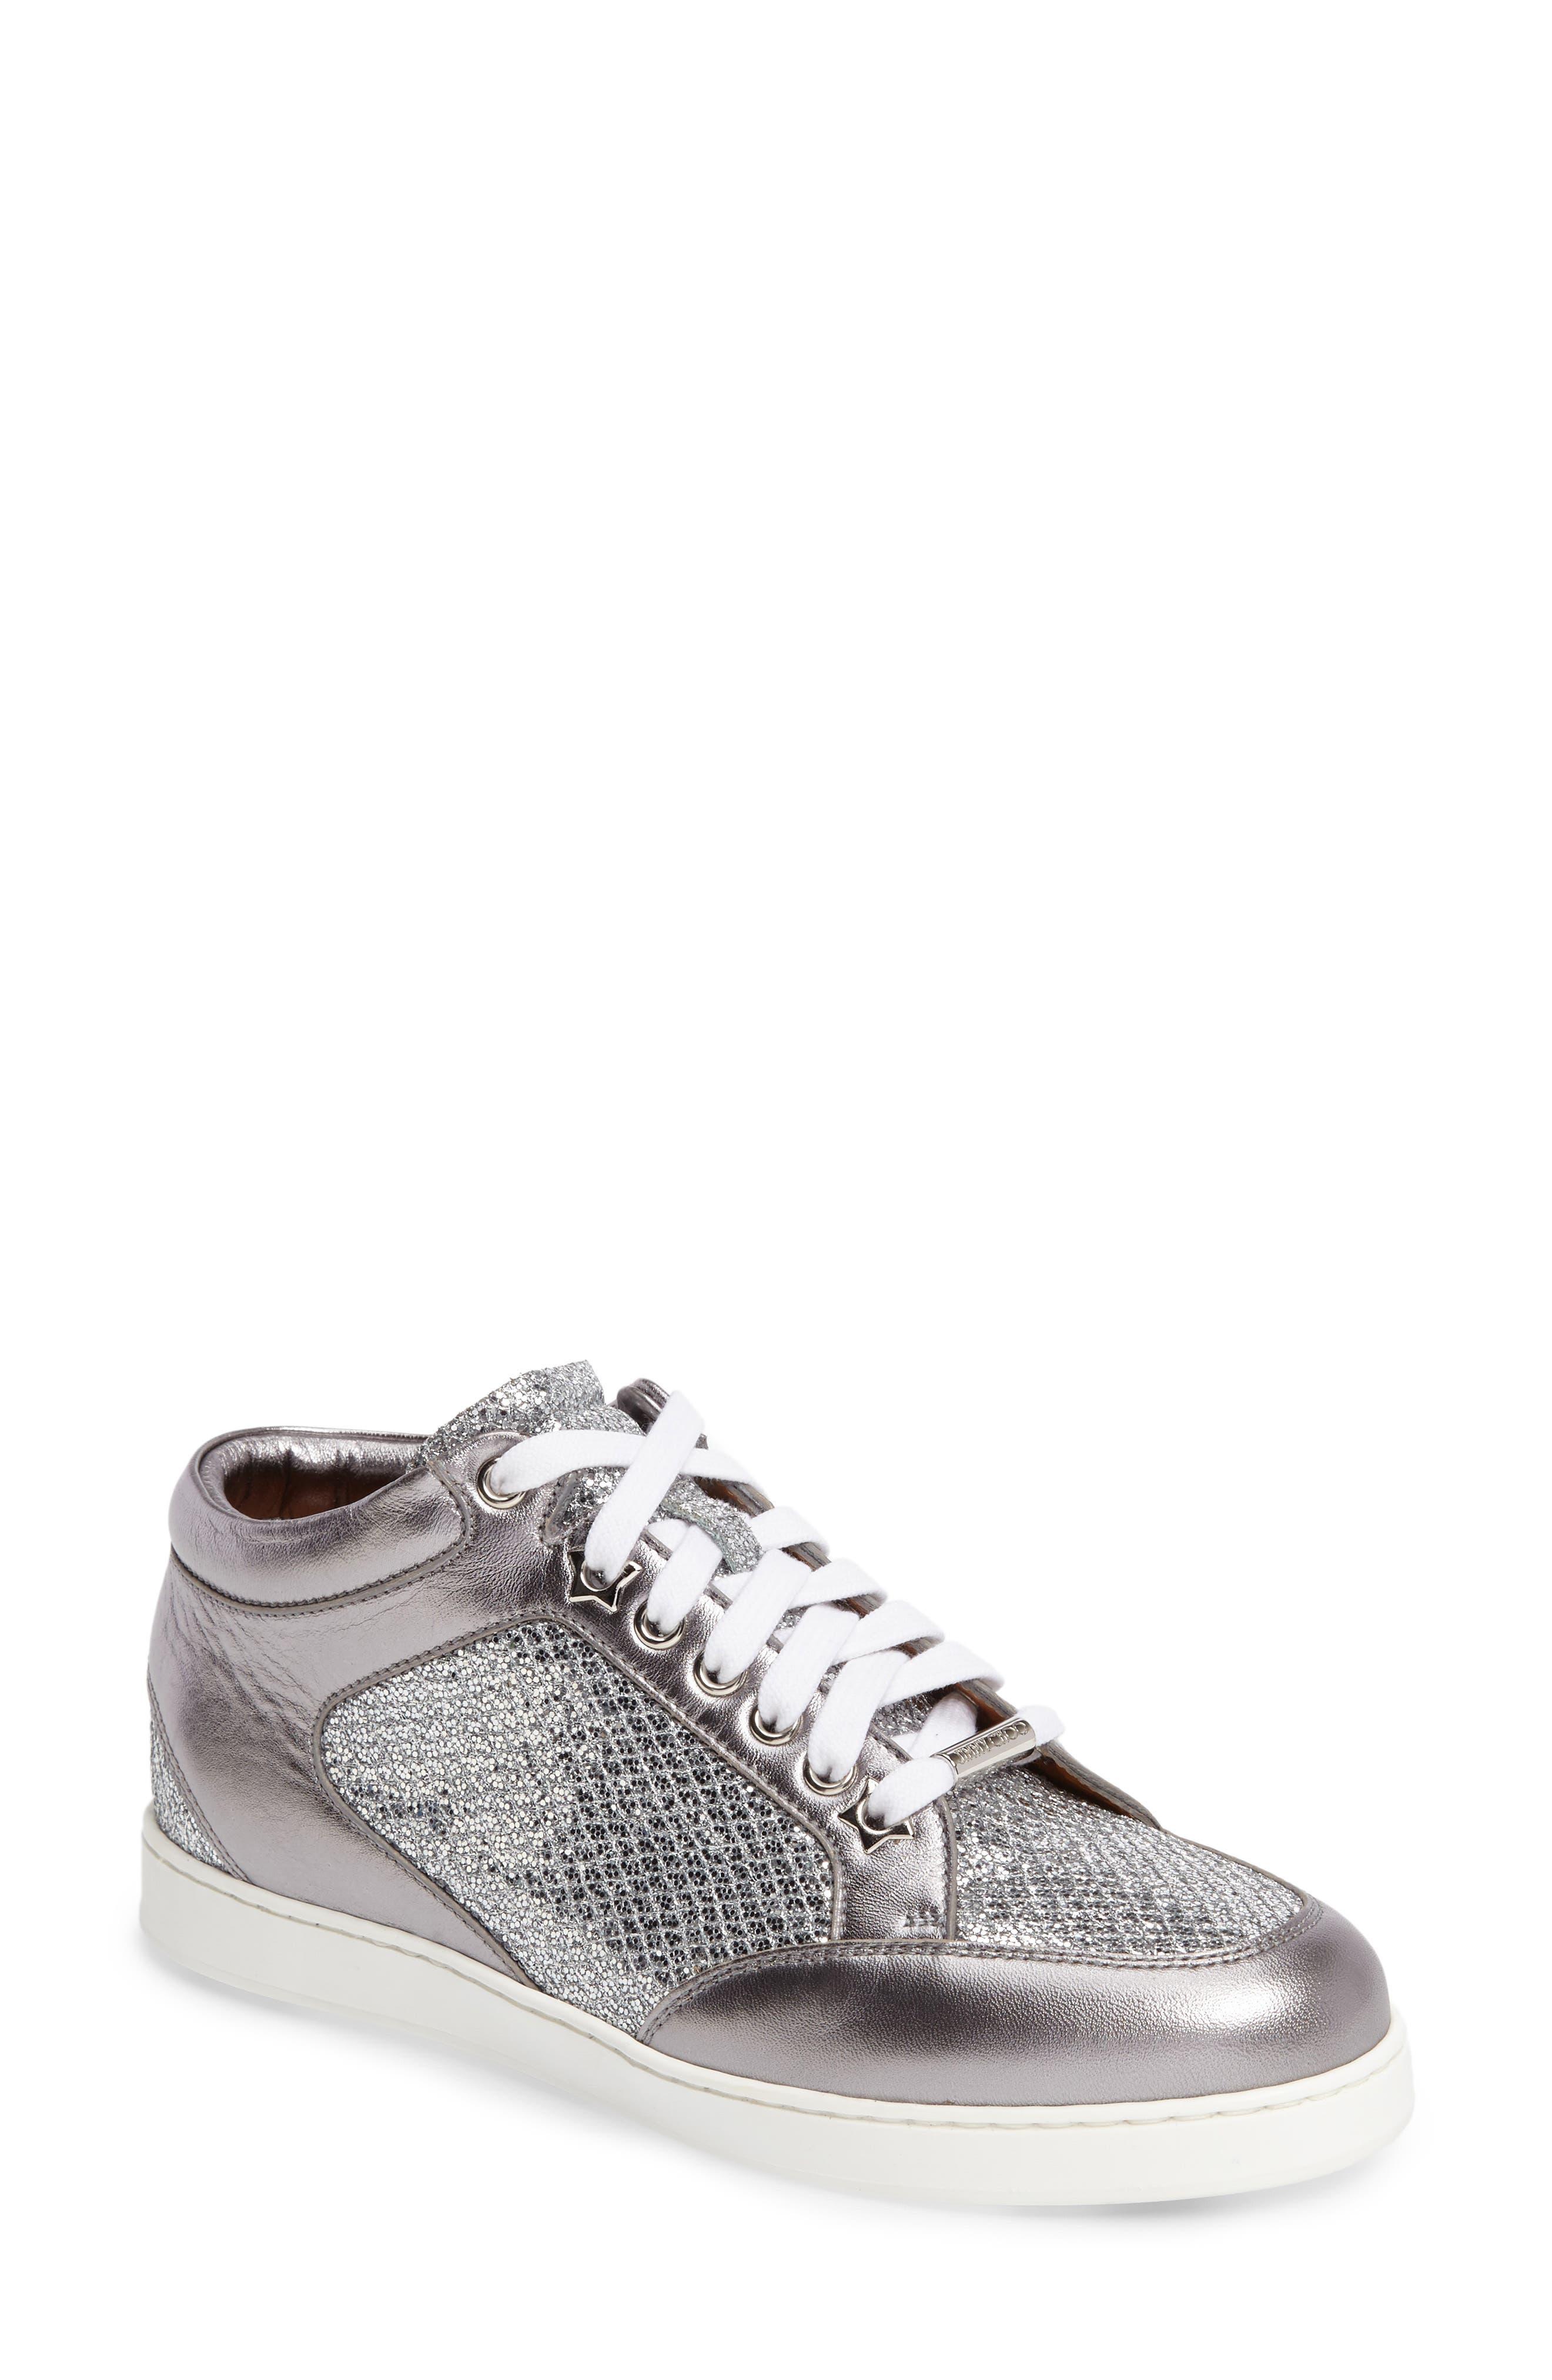 Alternate Image 1 Selected - Jimmy Choo Miami Glitter Sneaker (Women)